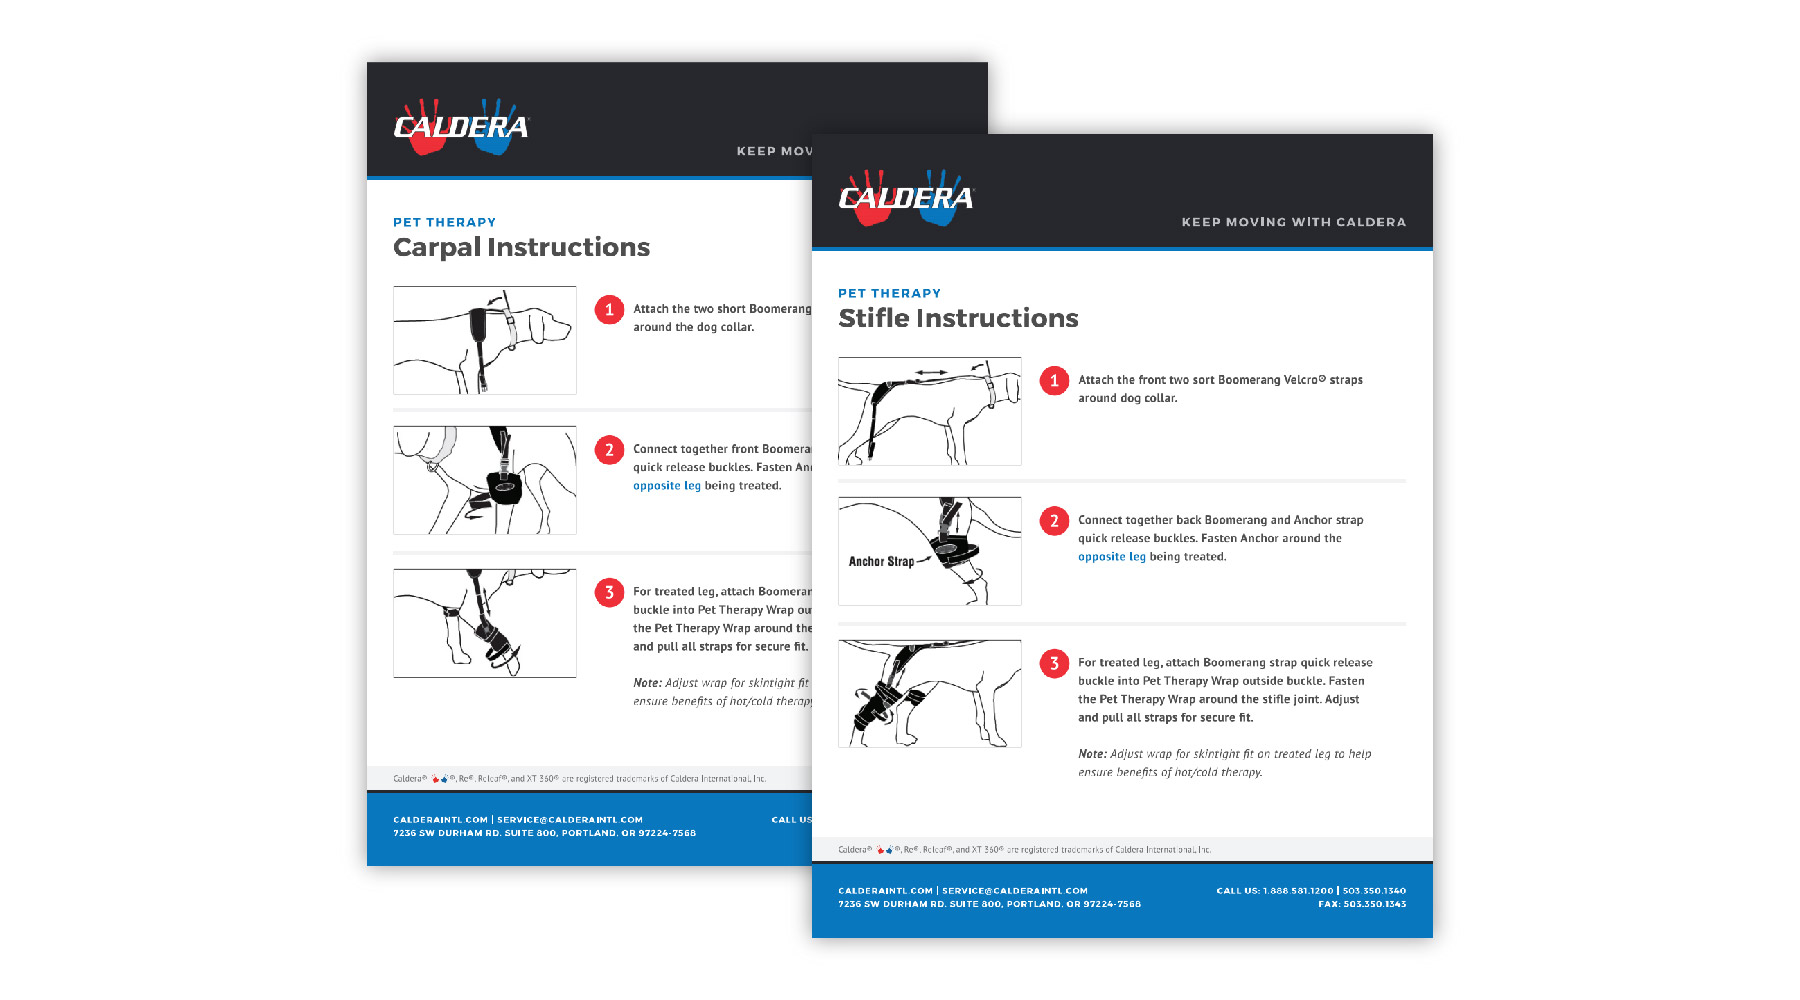 Caldera-Instructions.jpg